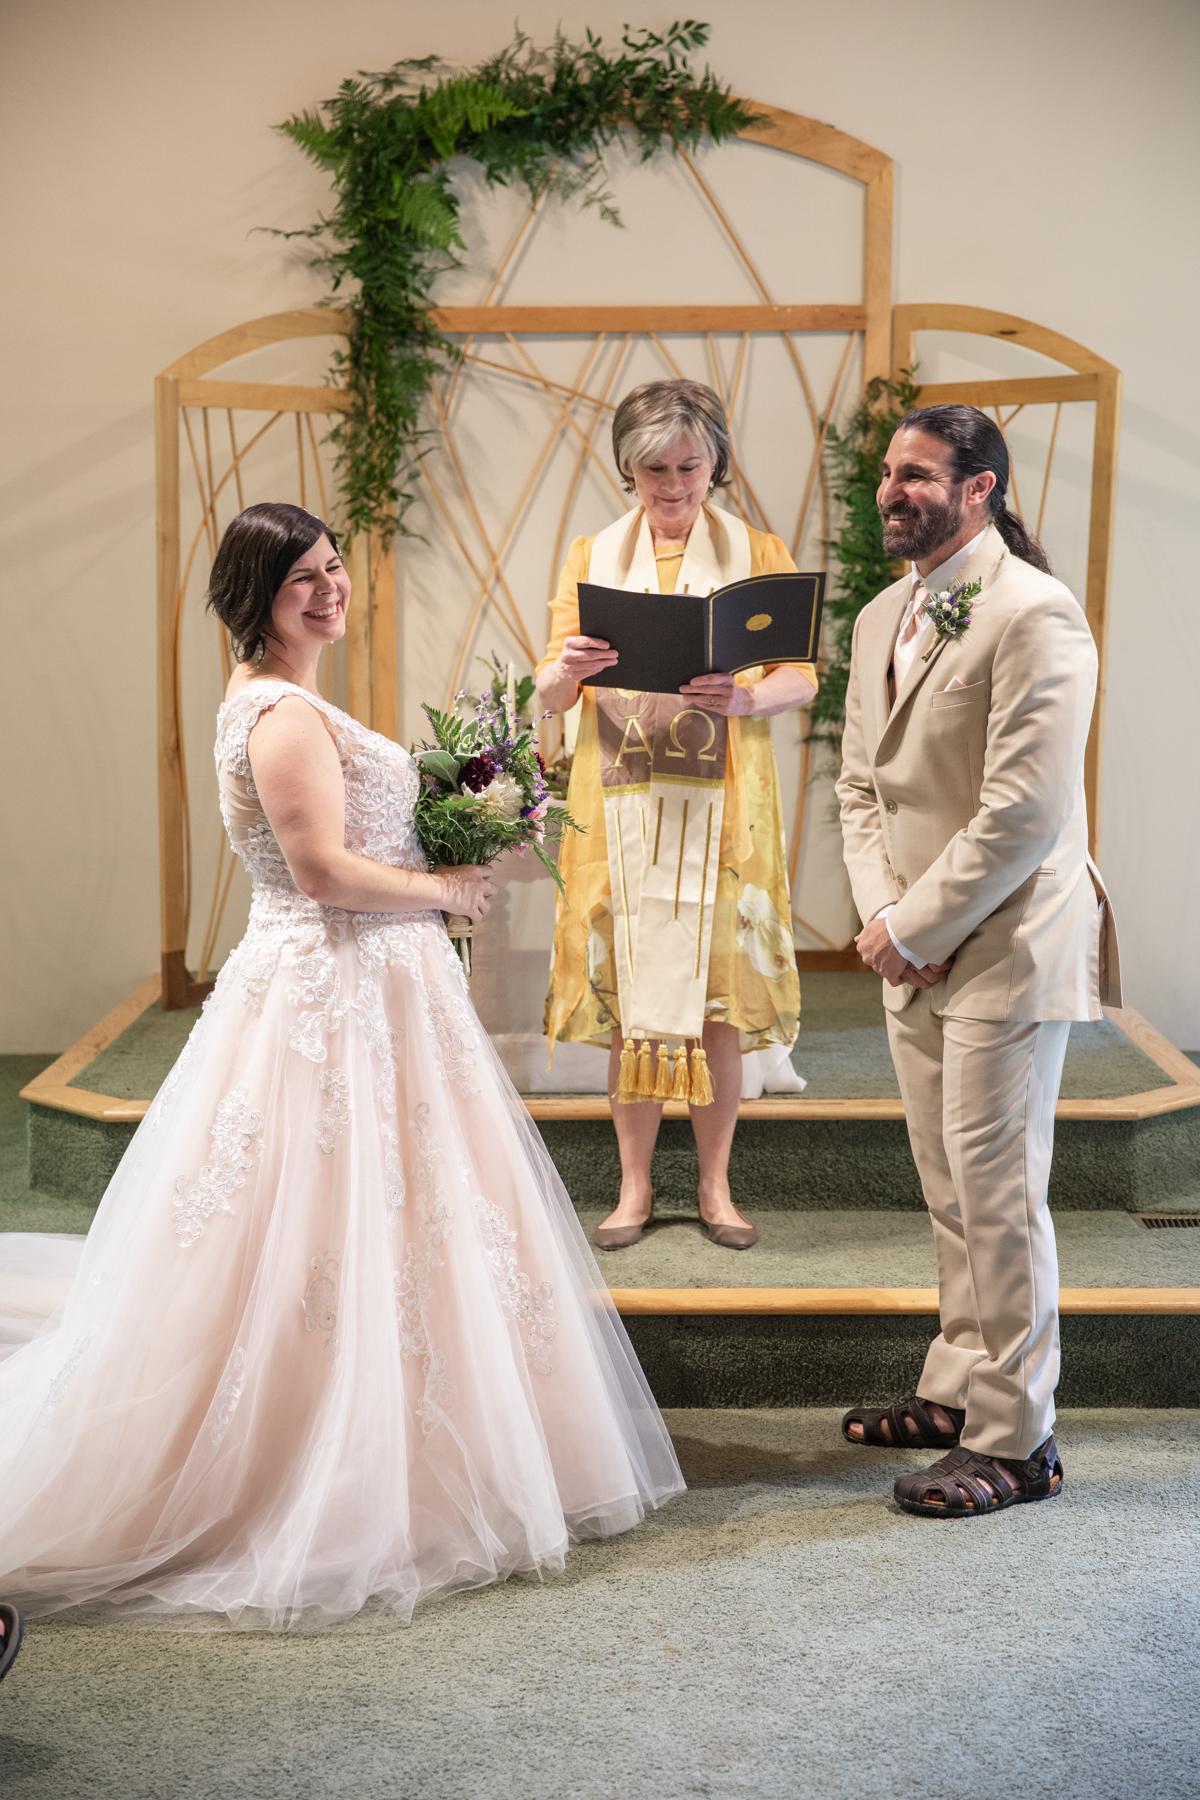 Avyanna and Phoenix Wedding- Photos by Studio Misha_BLOG-72.jpg